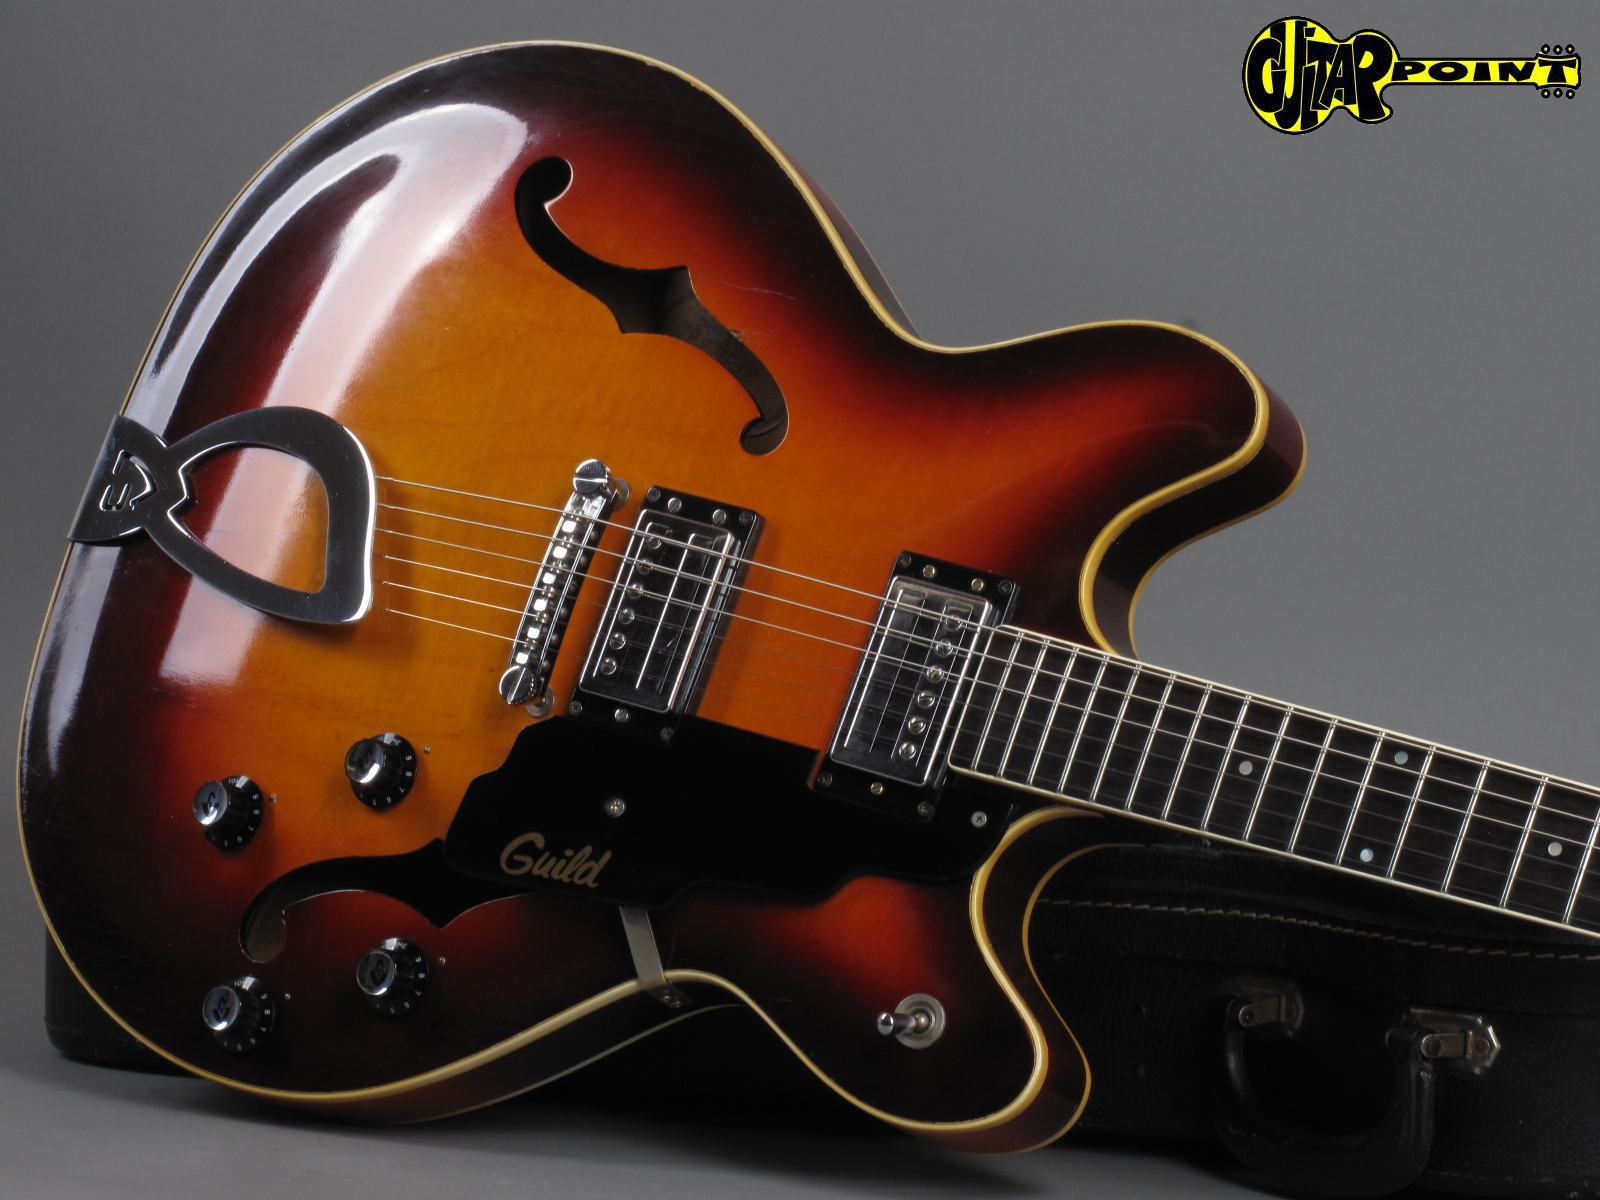 https://guitarpoint.de/app/uploads/products/1971-guild-starfire-iv-sunburst/Guild71SF4SB54182_19.jpg